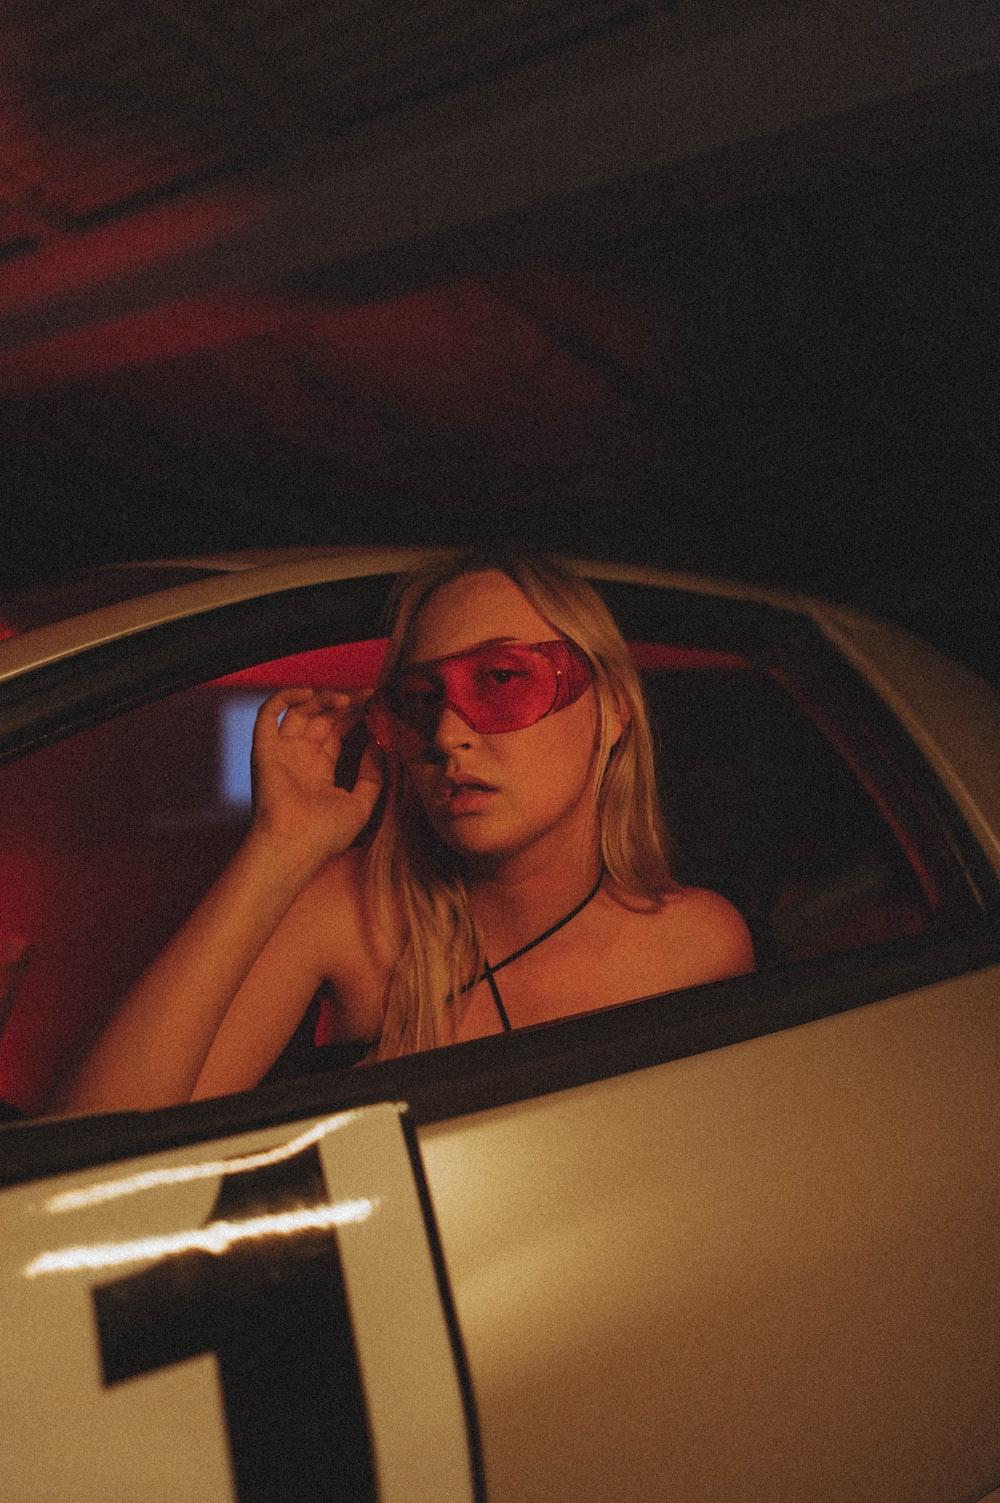 woman in black sunglasses inside car